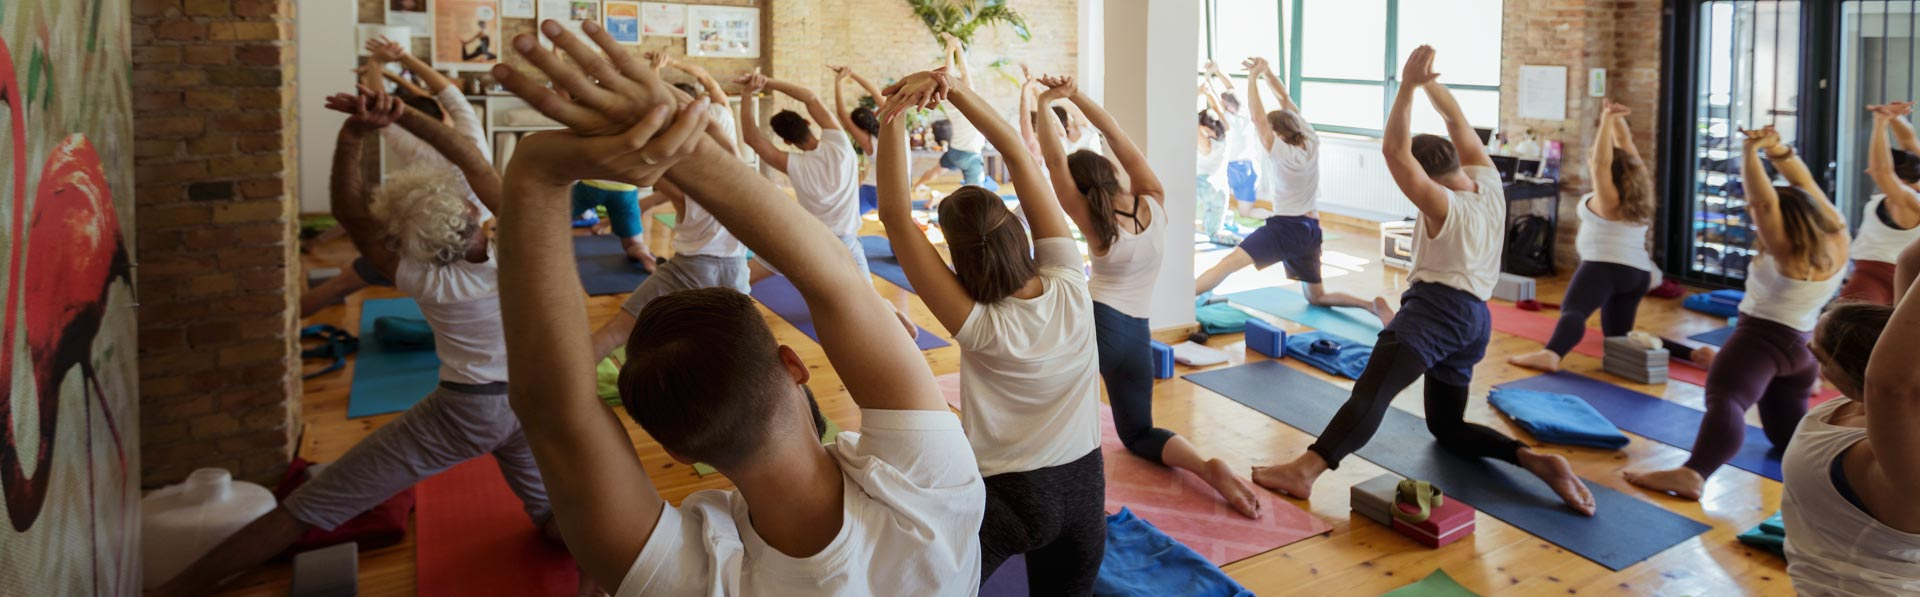 Yoga Präventionskurse bei yogafürdich Berlin